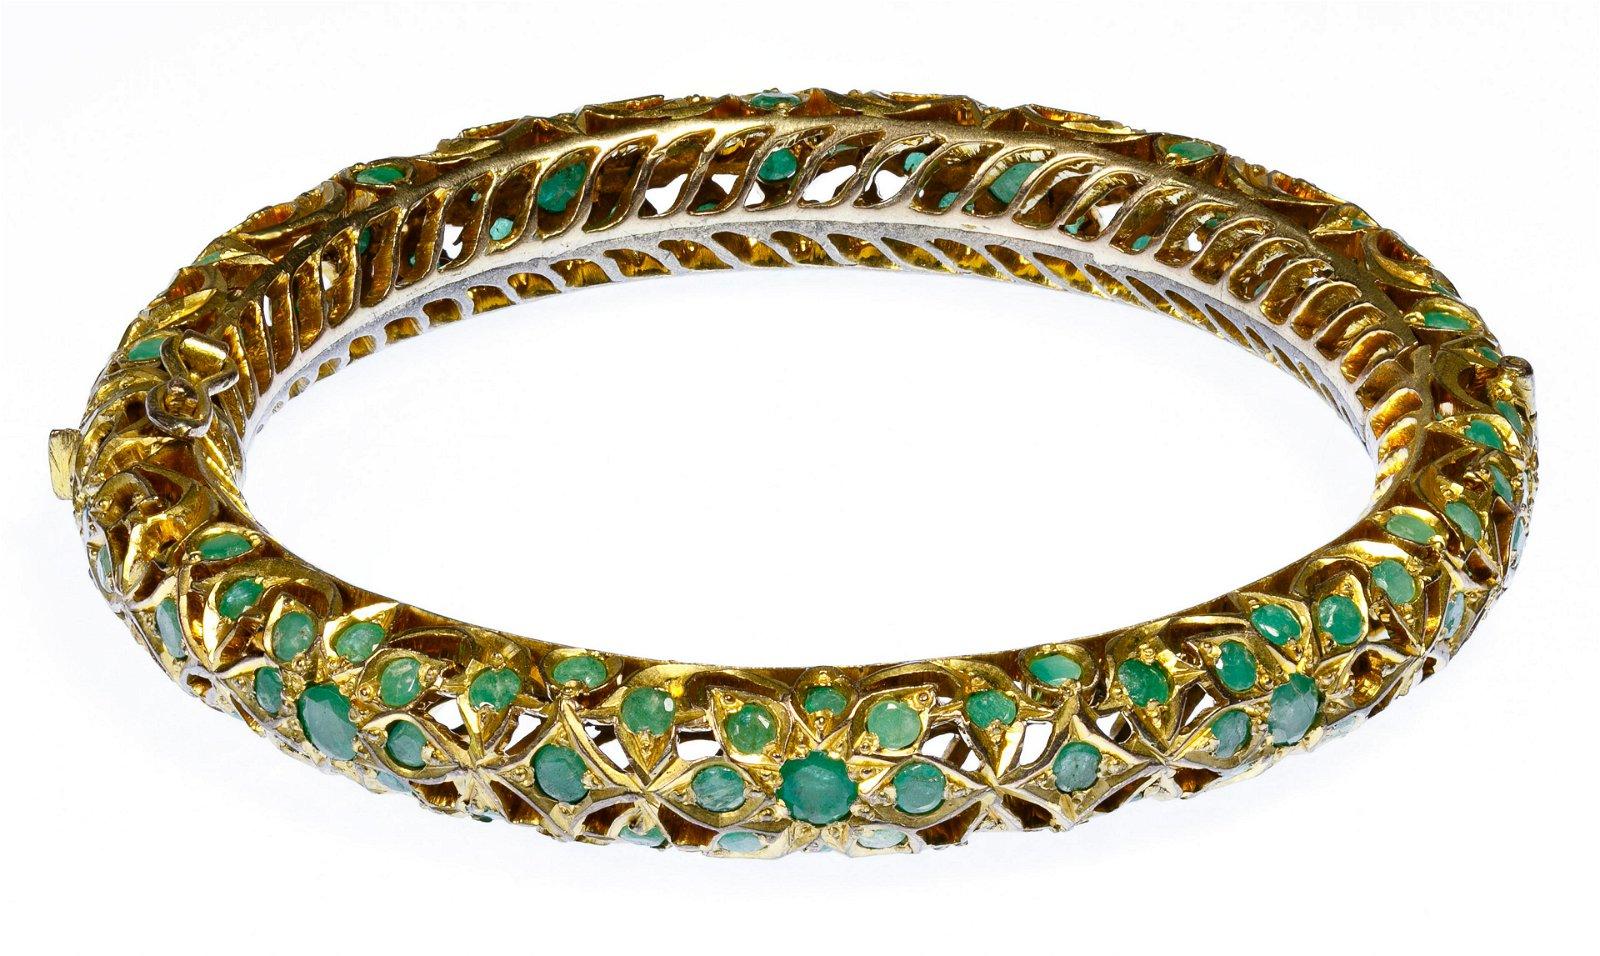 Indian Emerald and Brass Hinged Bangle Bracelet